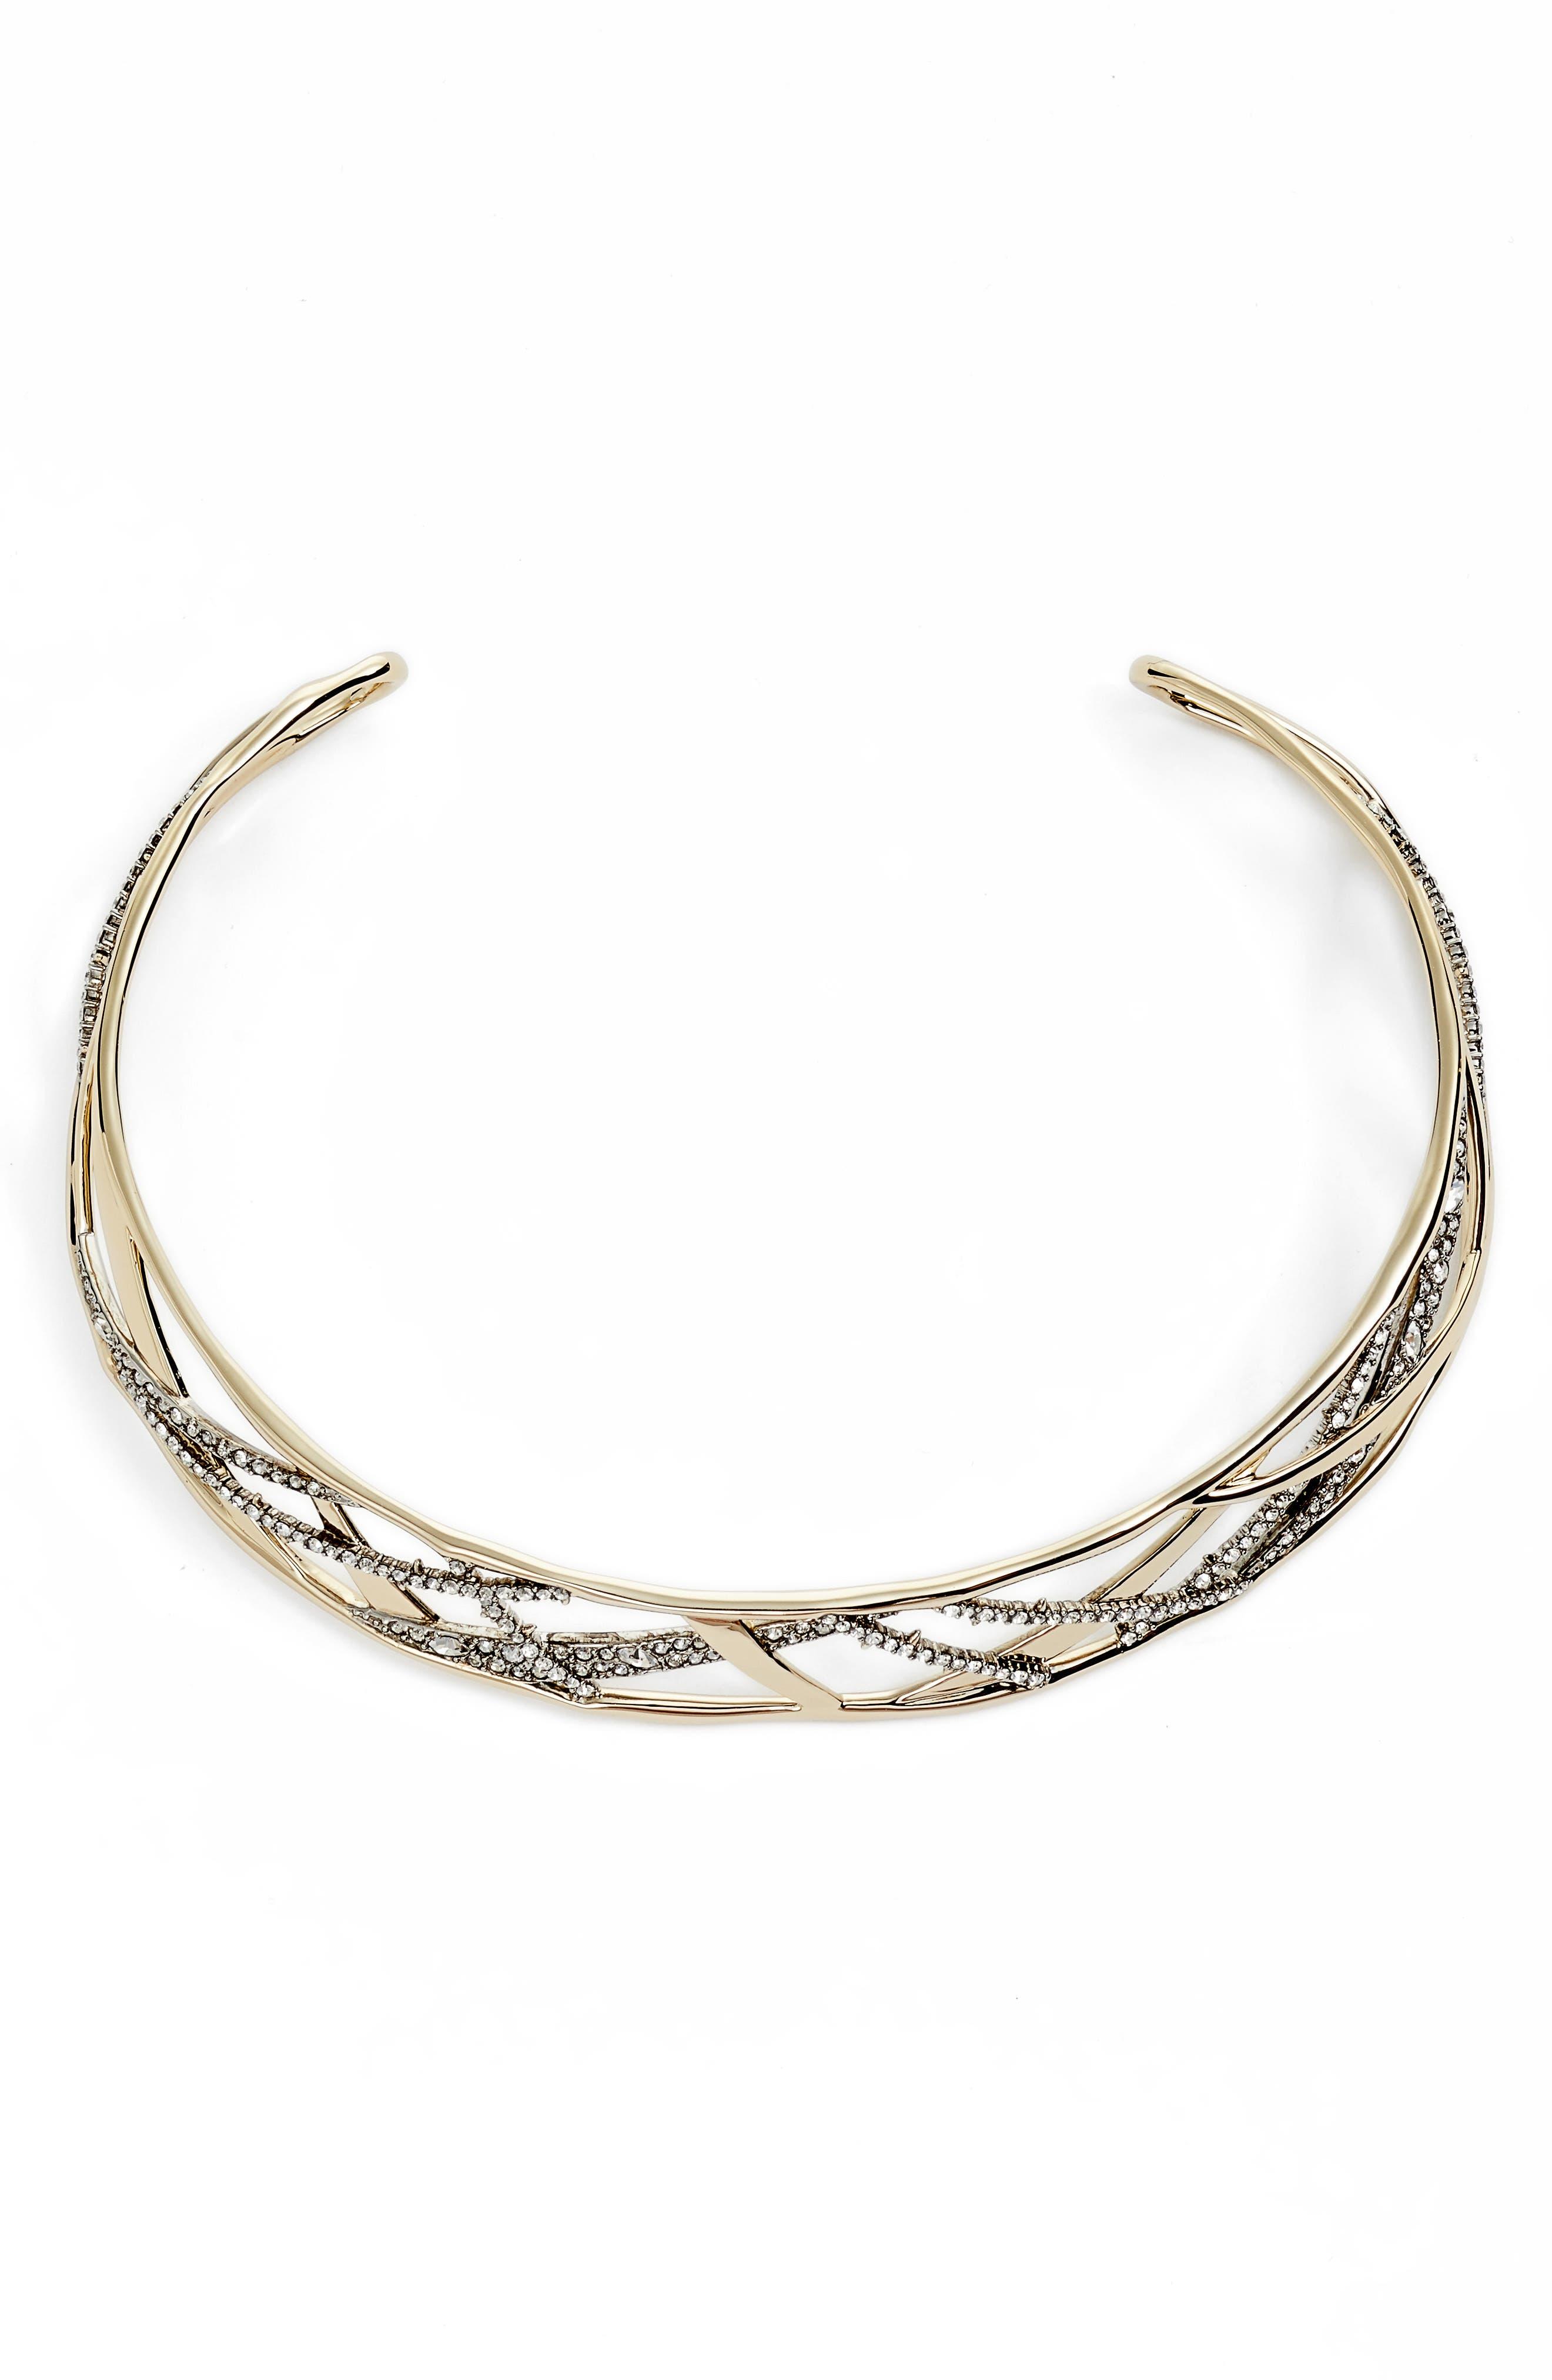 Alexis Bittar Crystal Encrusted Plaid Collar Necklace Mg7jRlvDv